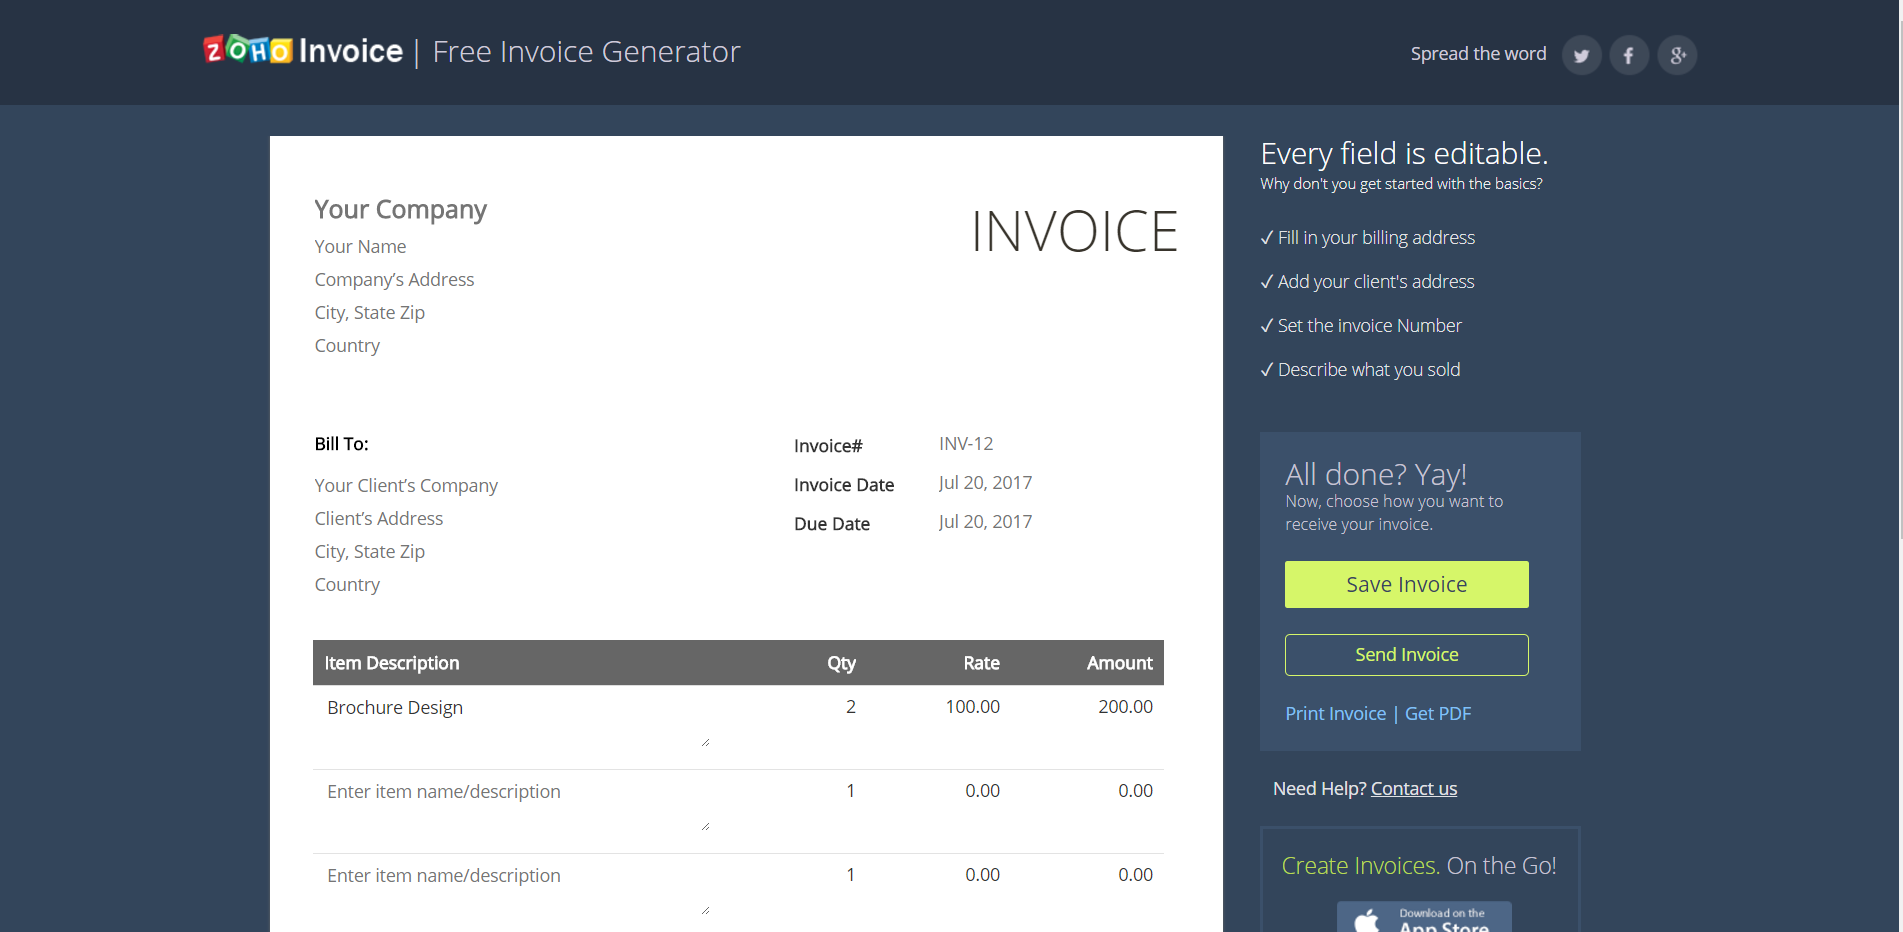 Best Free Invoice Generators